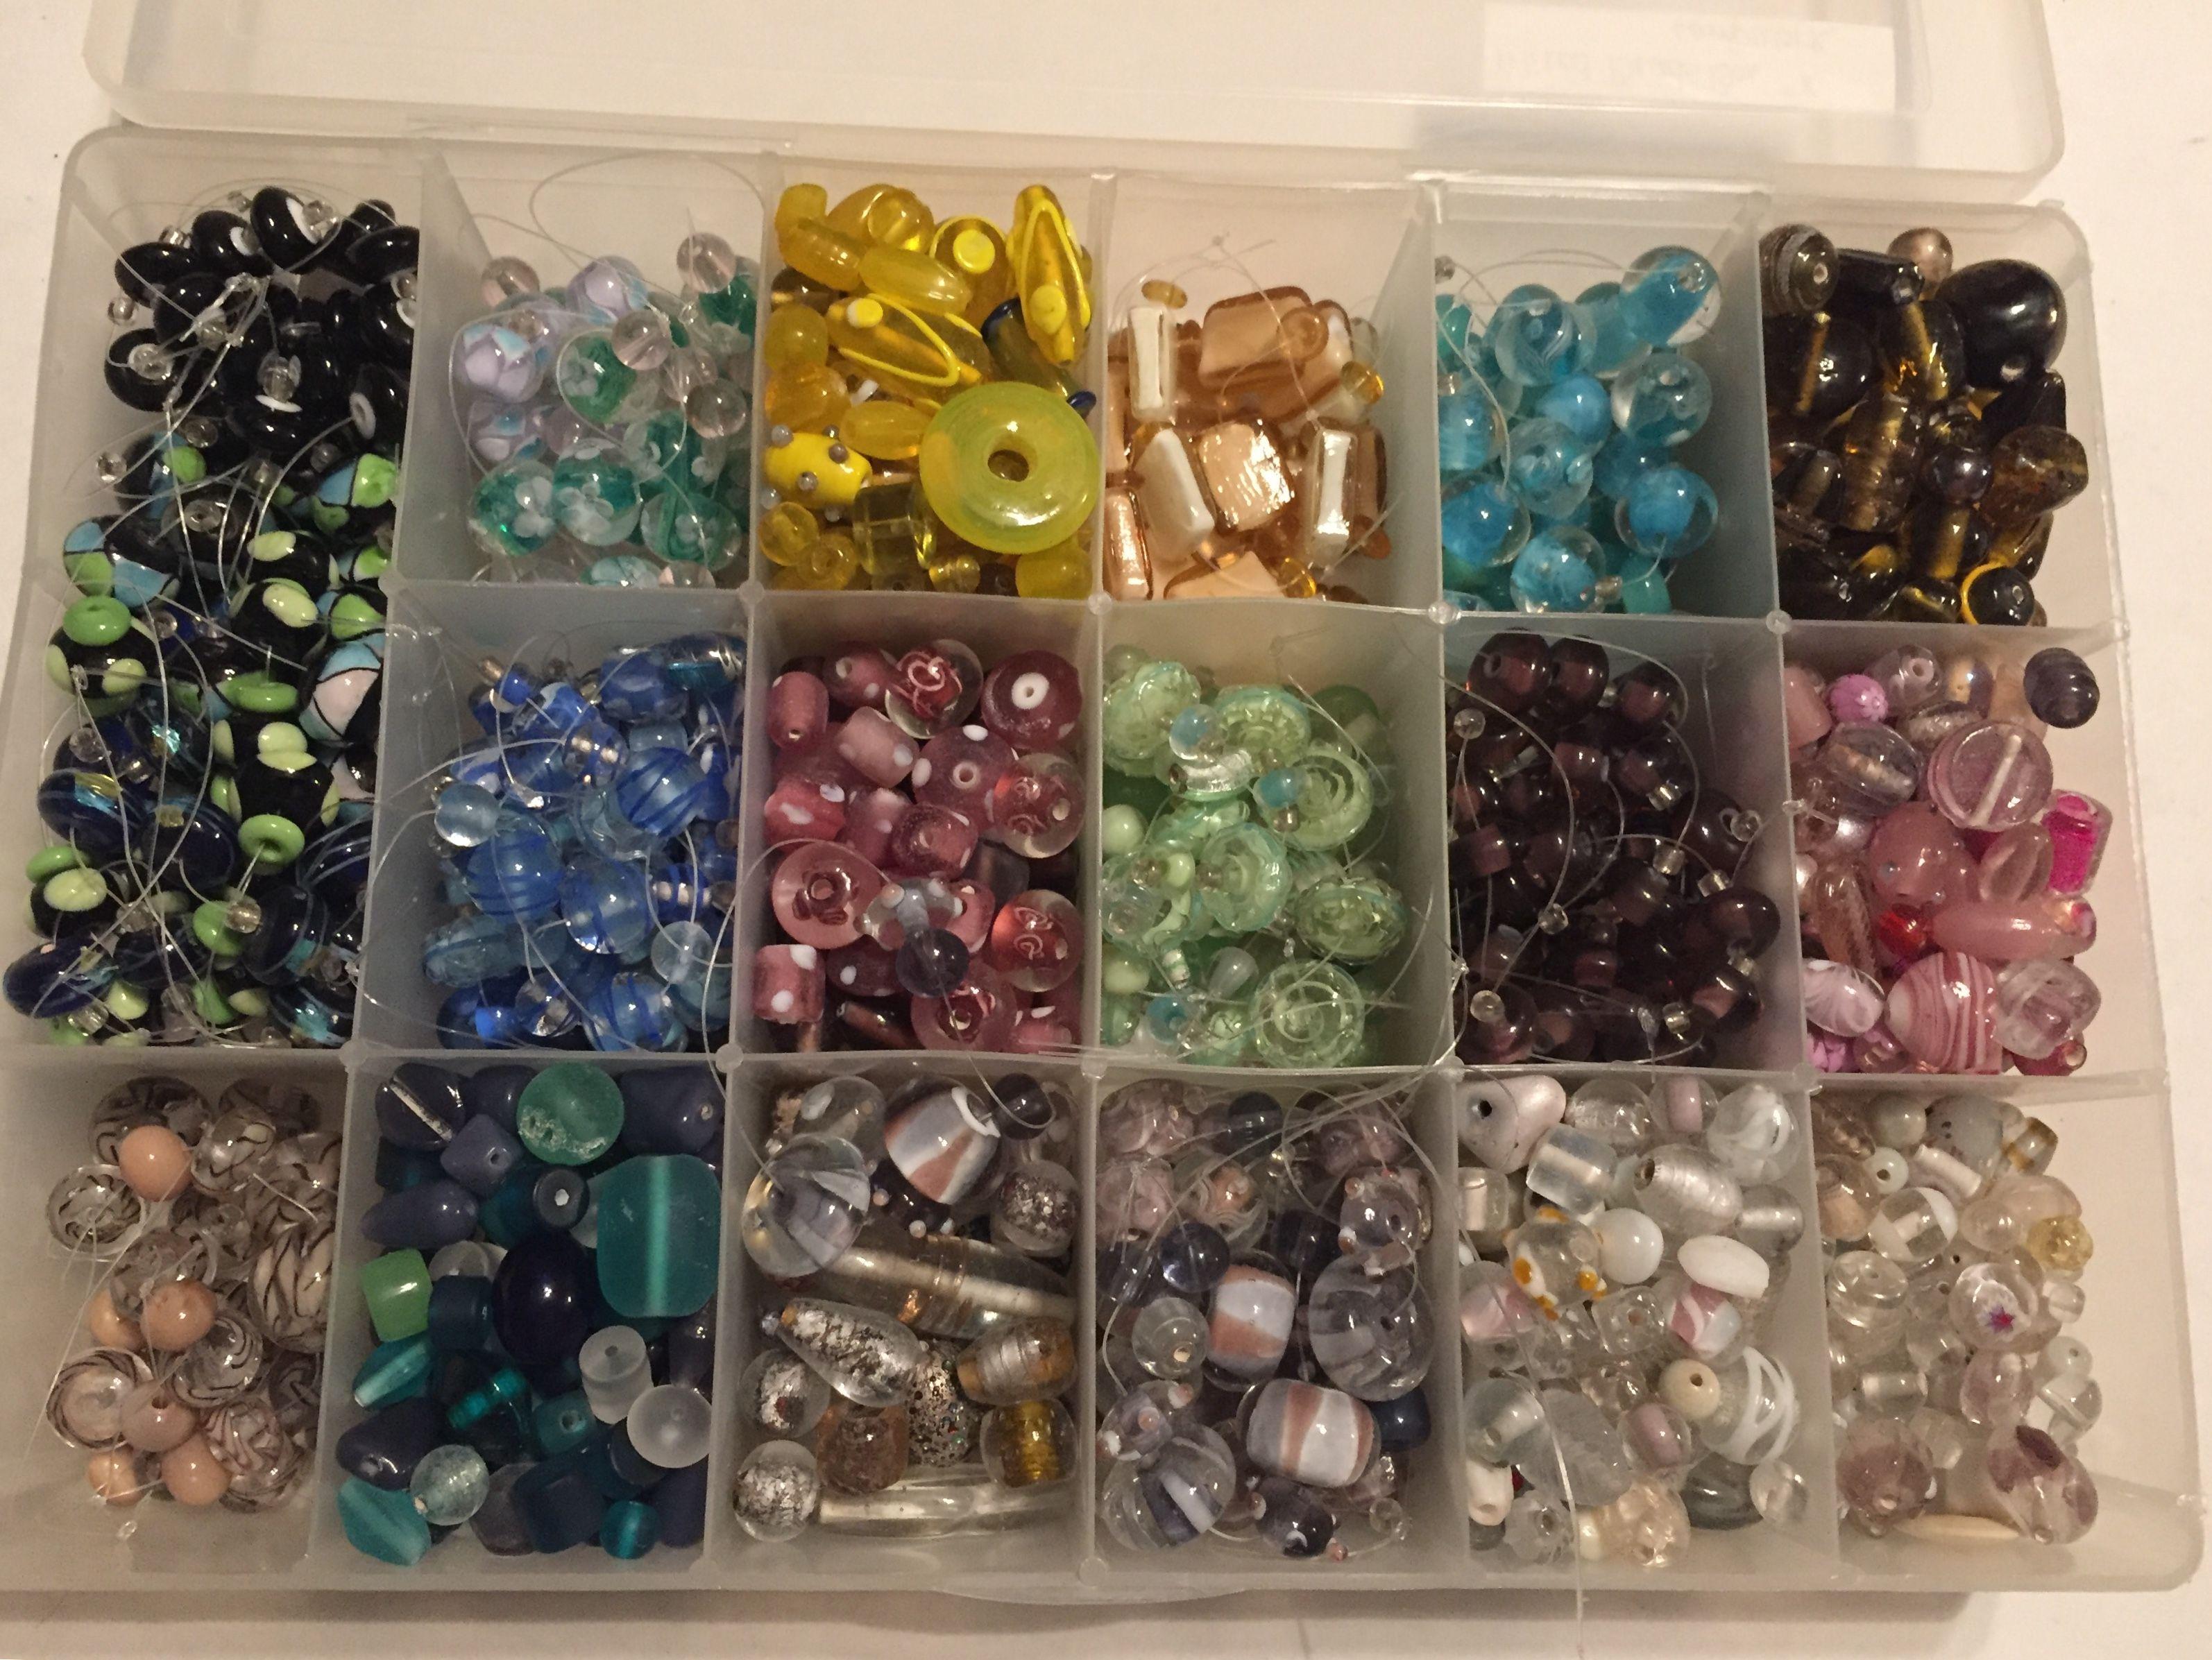 Flower Beads Jewelry Making 1 lb Lampwork Glass Beads  Bulk Lot Blue DIY Craft